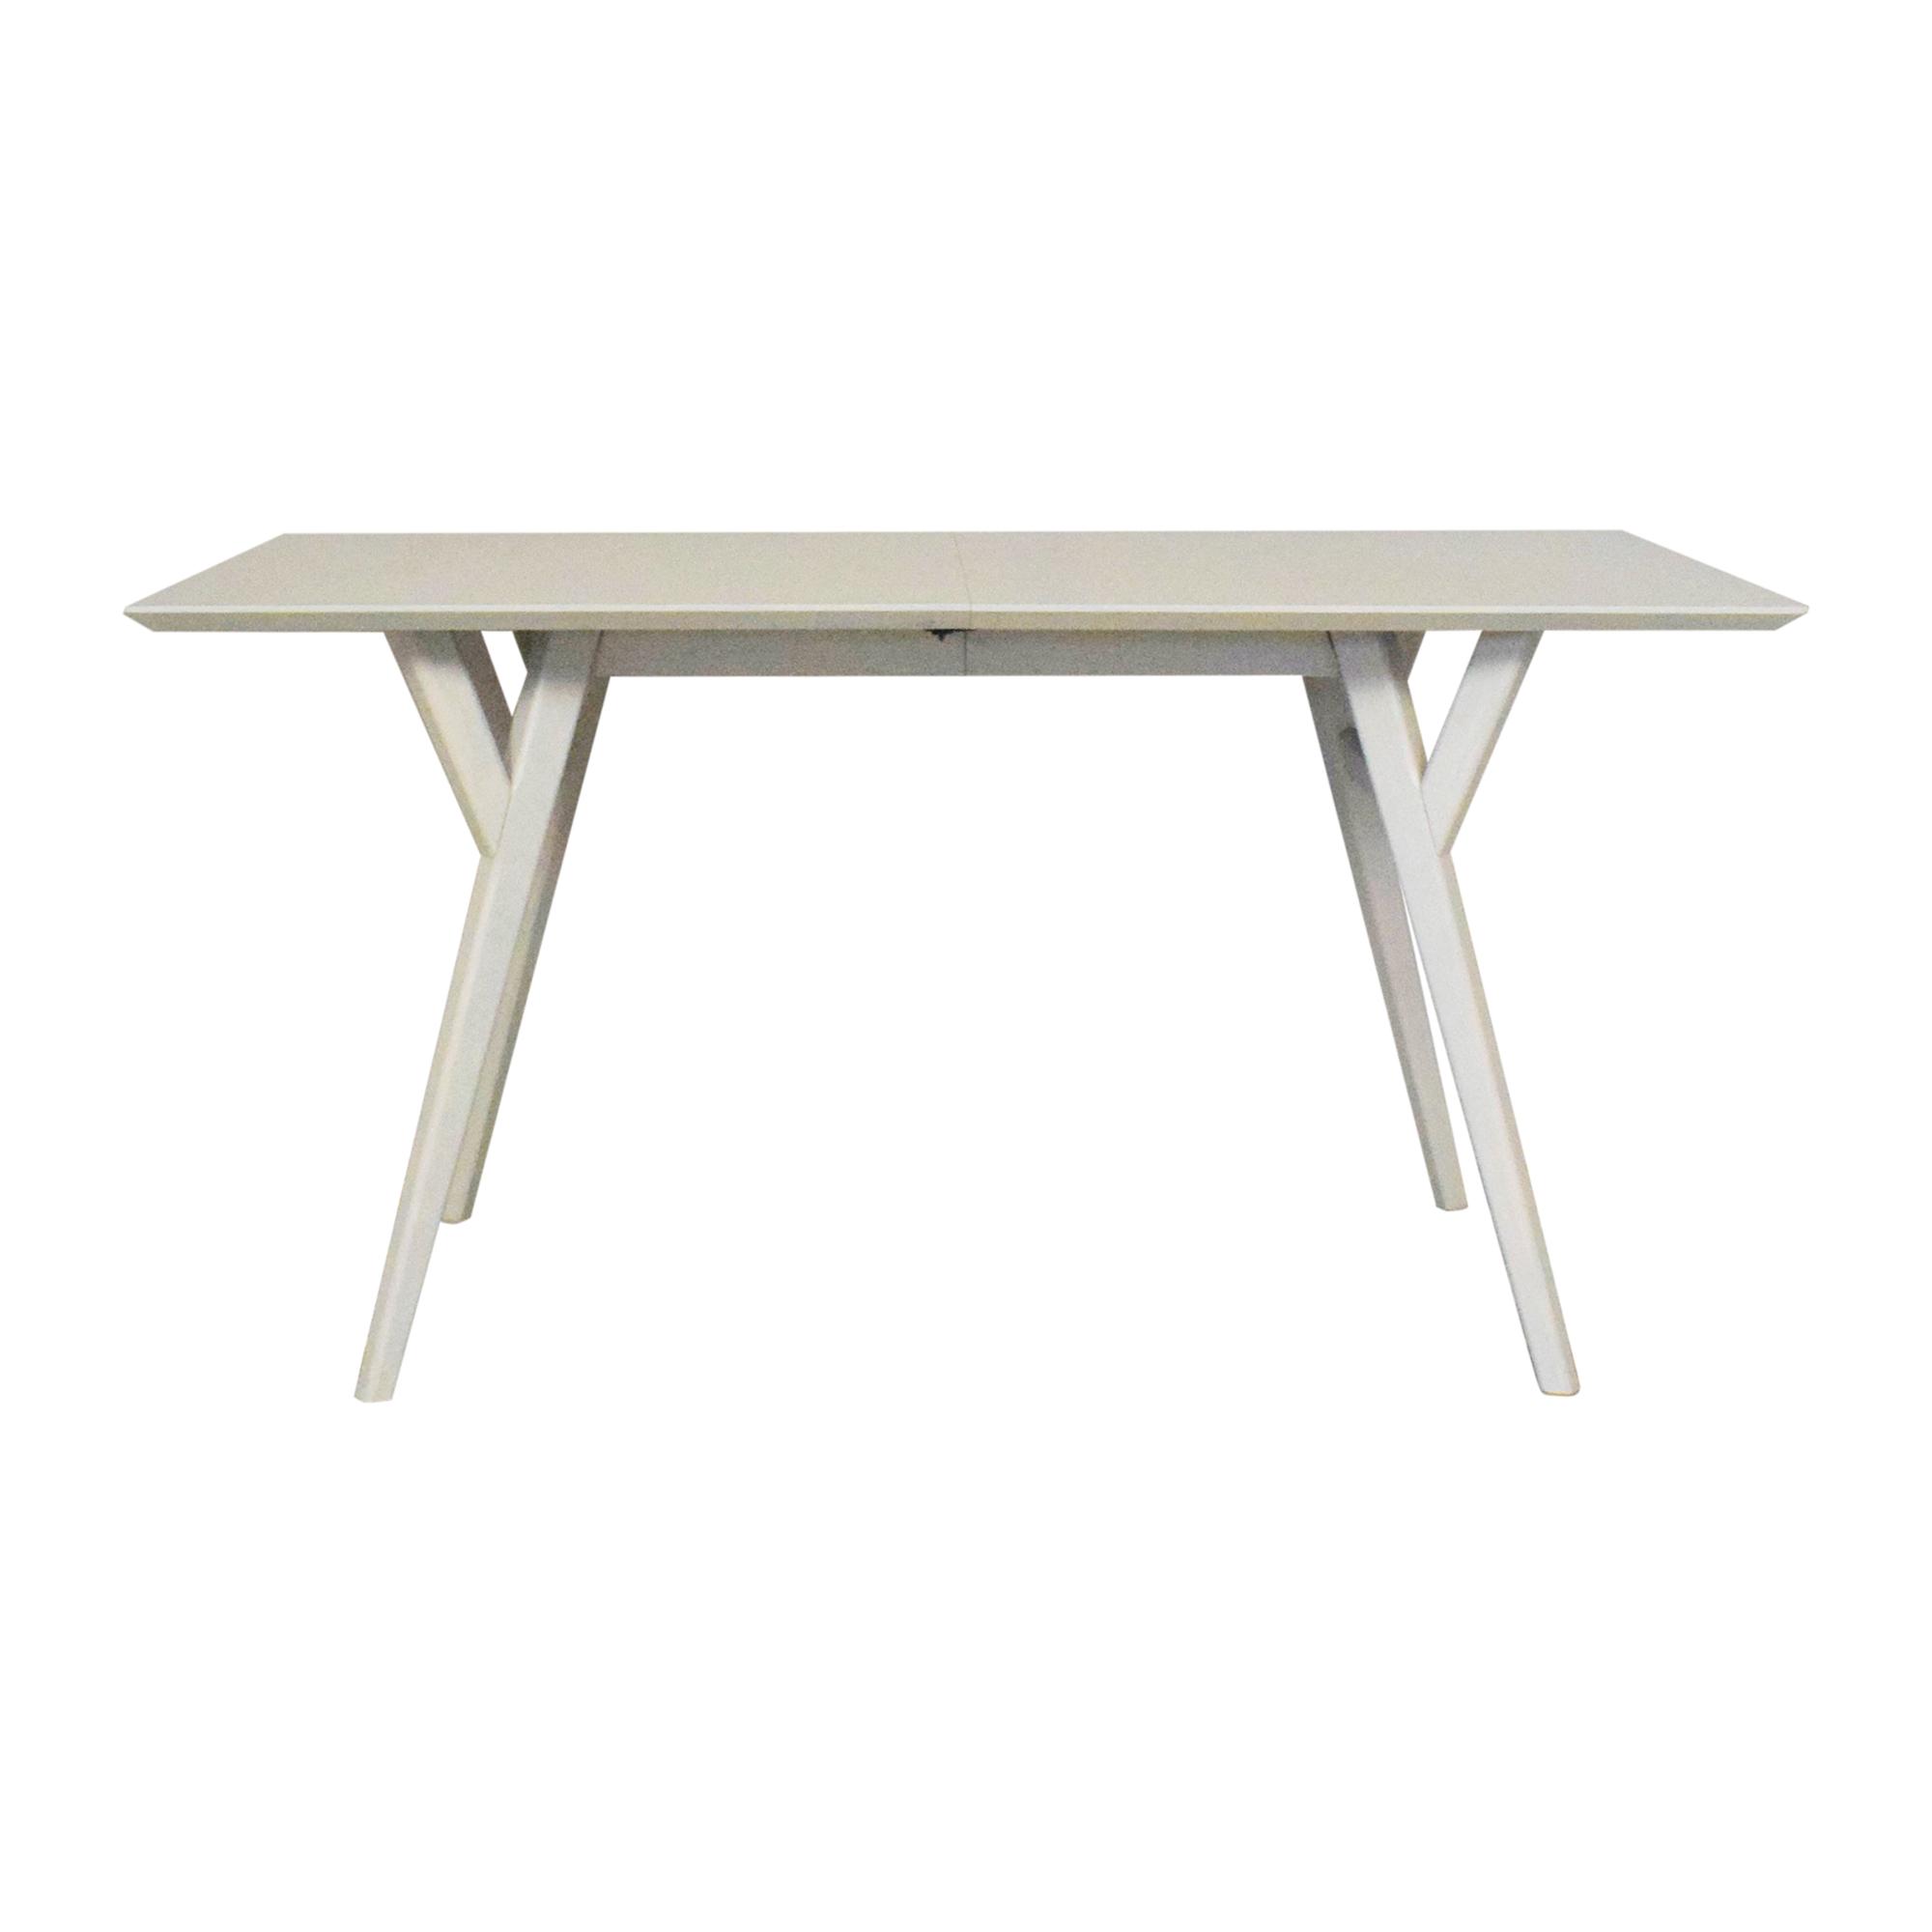 buy West Elm West Elm Mid Century Expandable Dining Table online